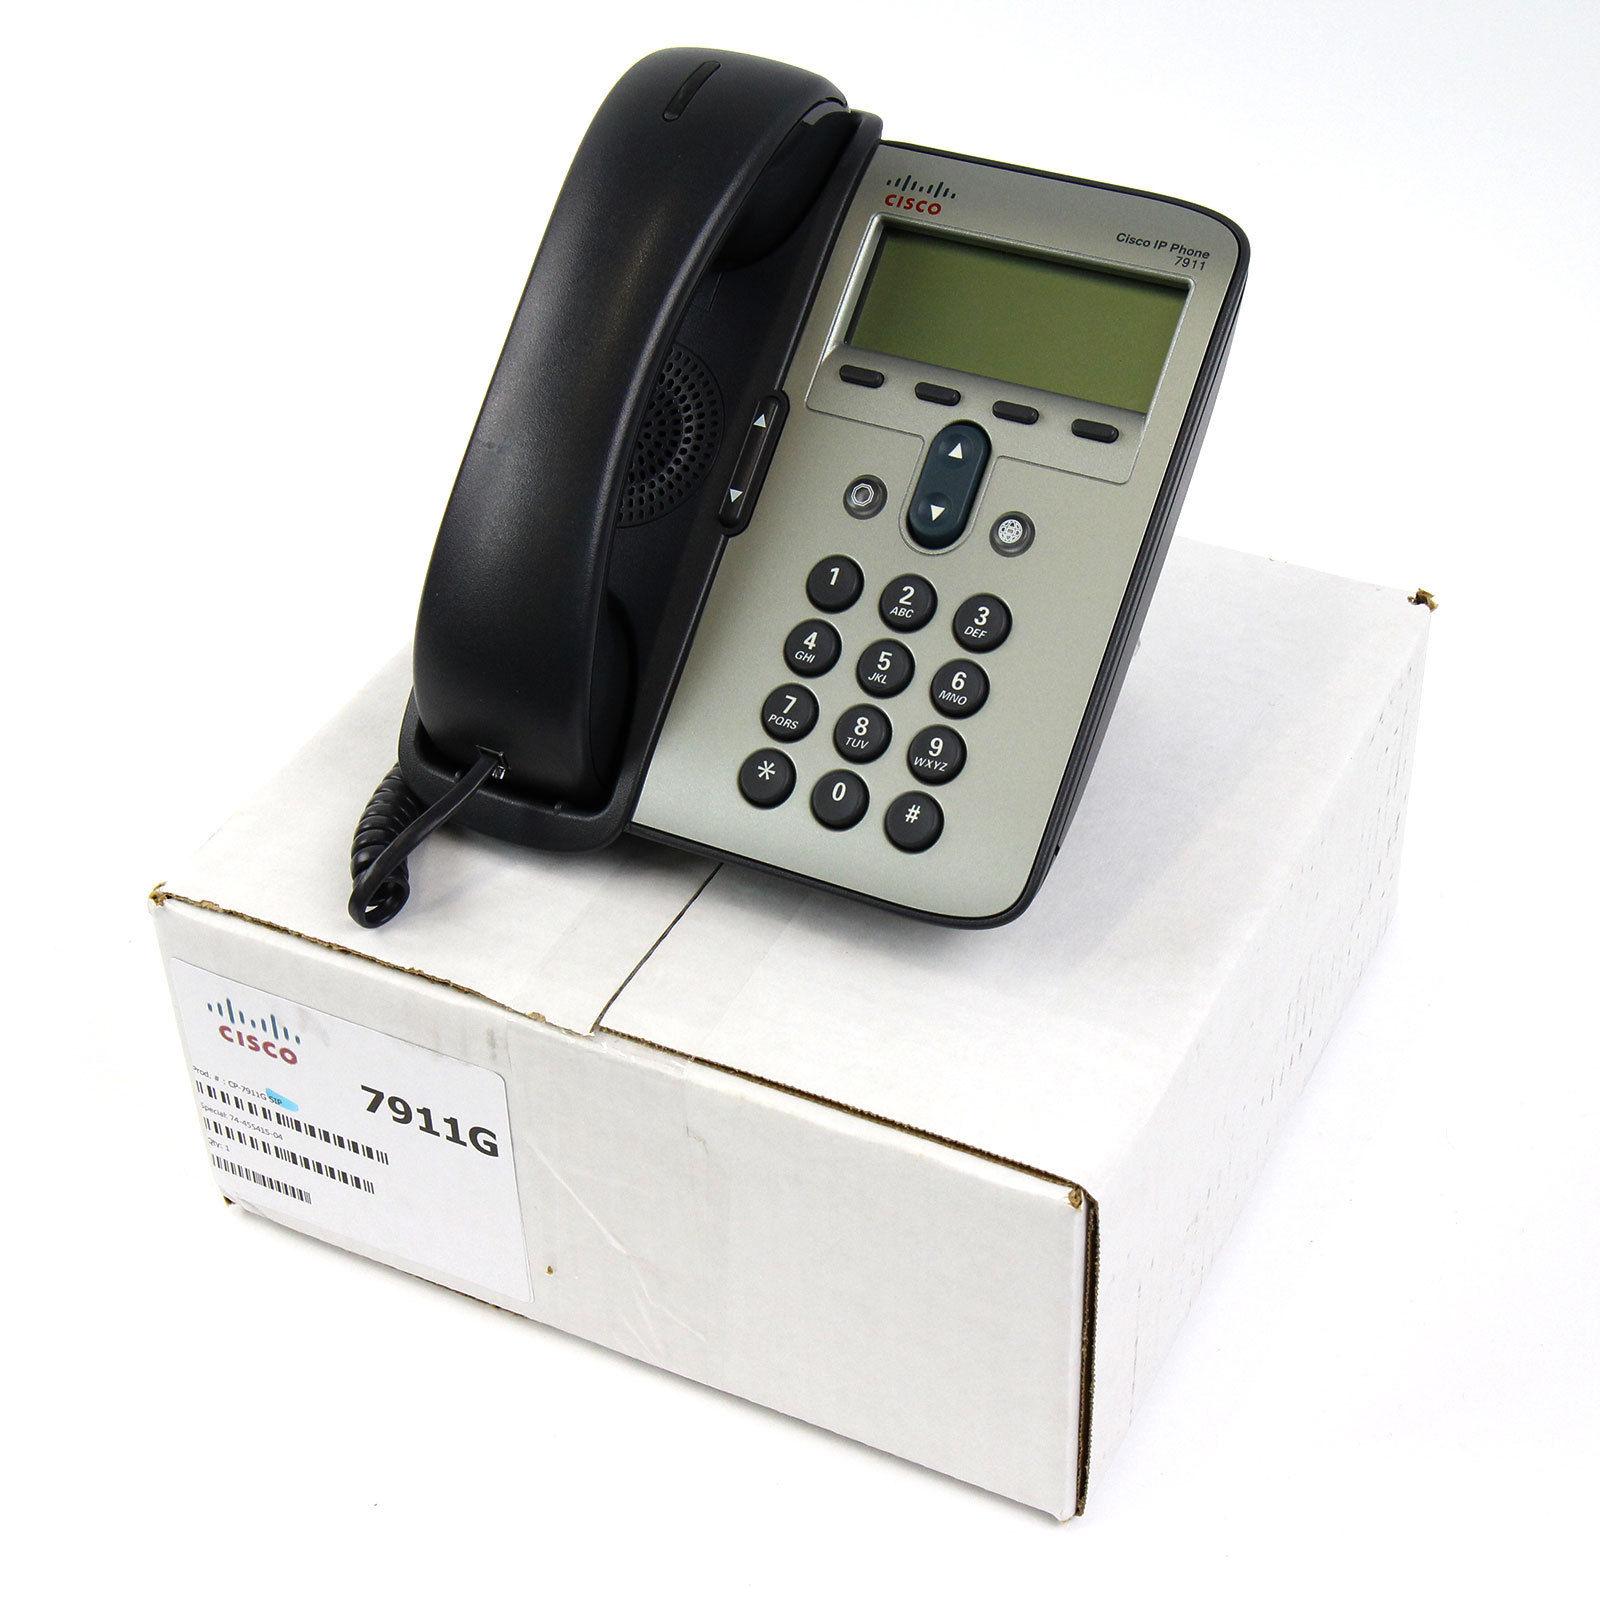 Cisco CP-7911G 7911 SIP IP Telephone PoE - Lot 1828631036361 | eBay